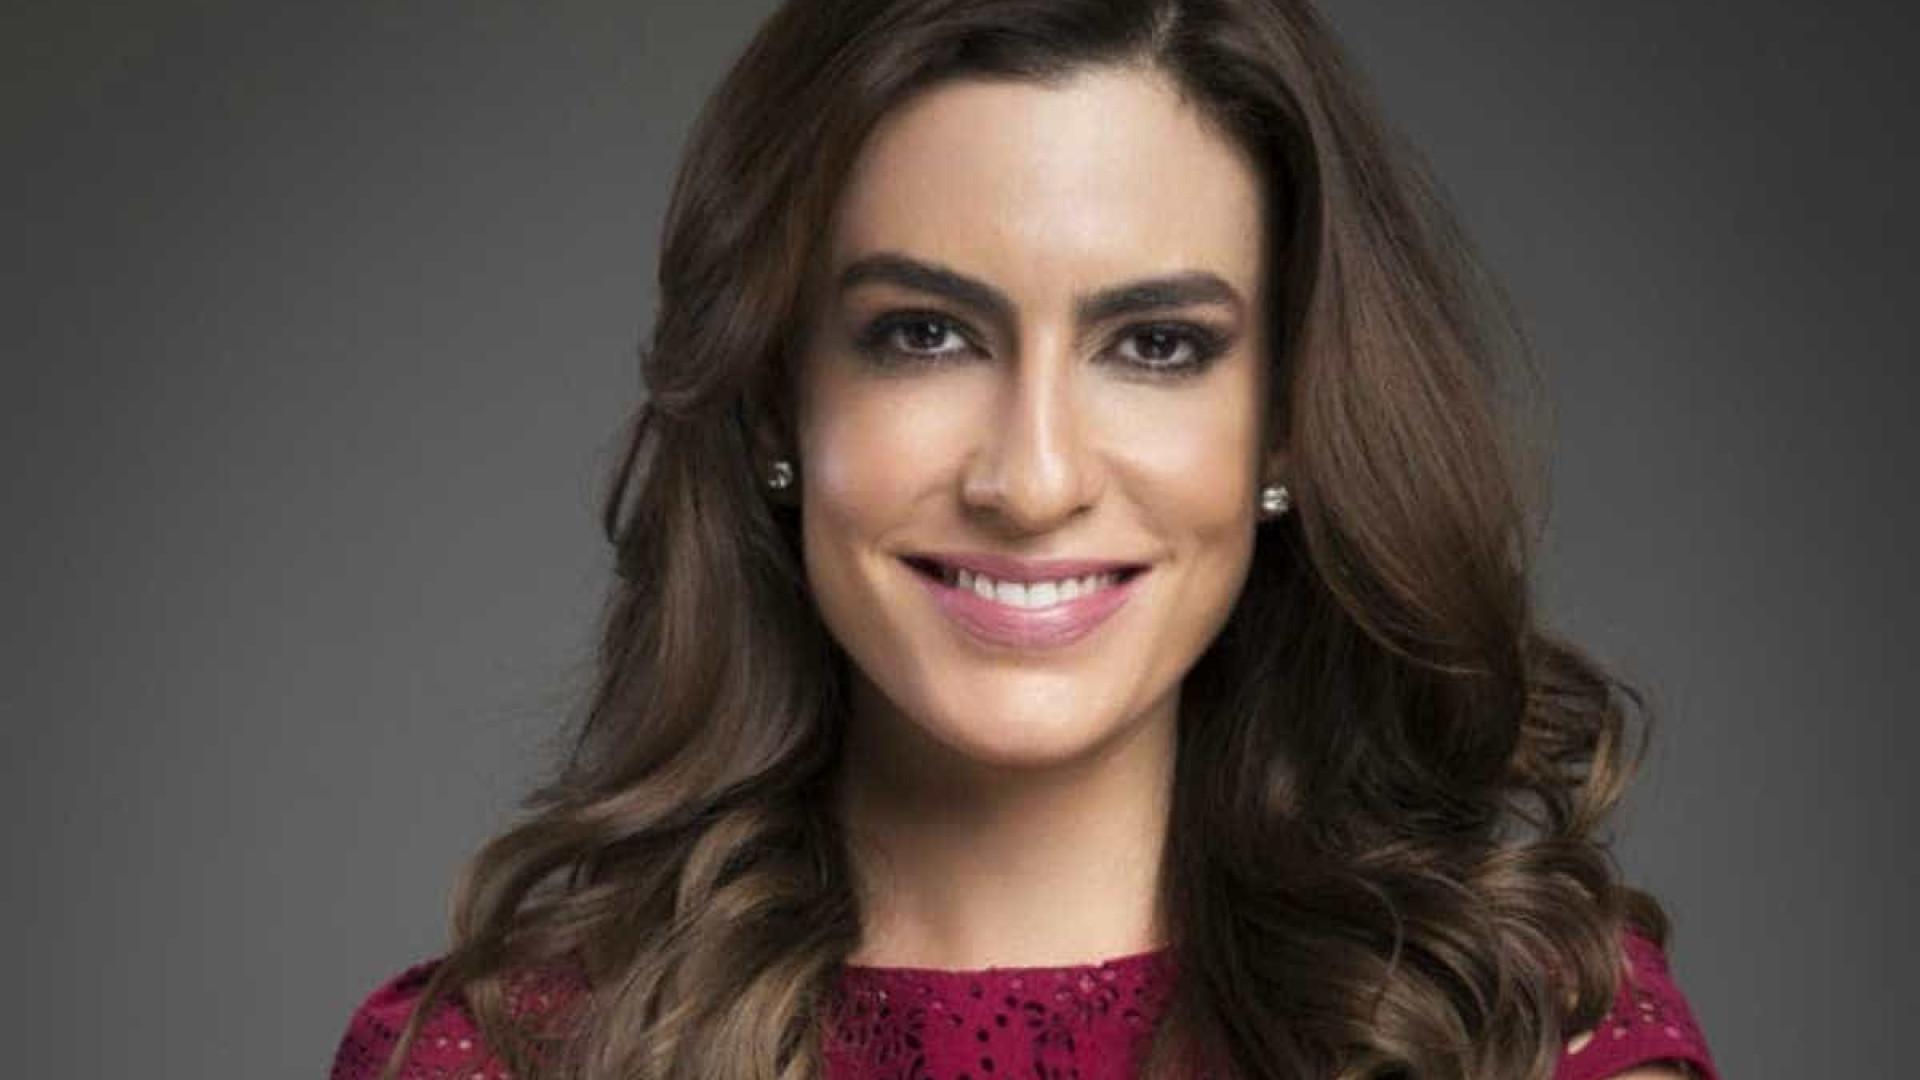 SBT decide sobre futuro de Ticiana Villas Boas  na emissora